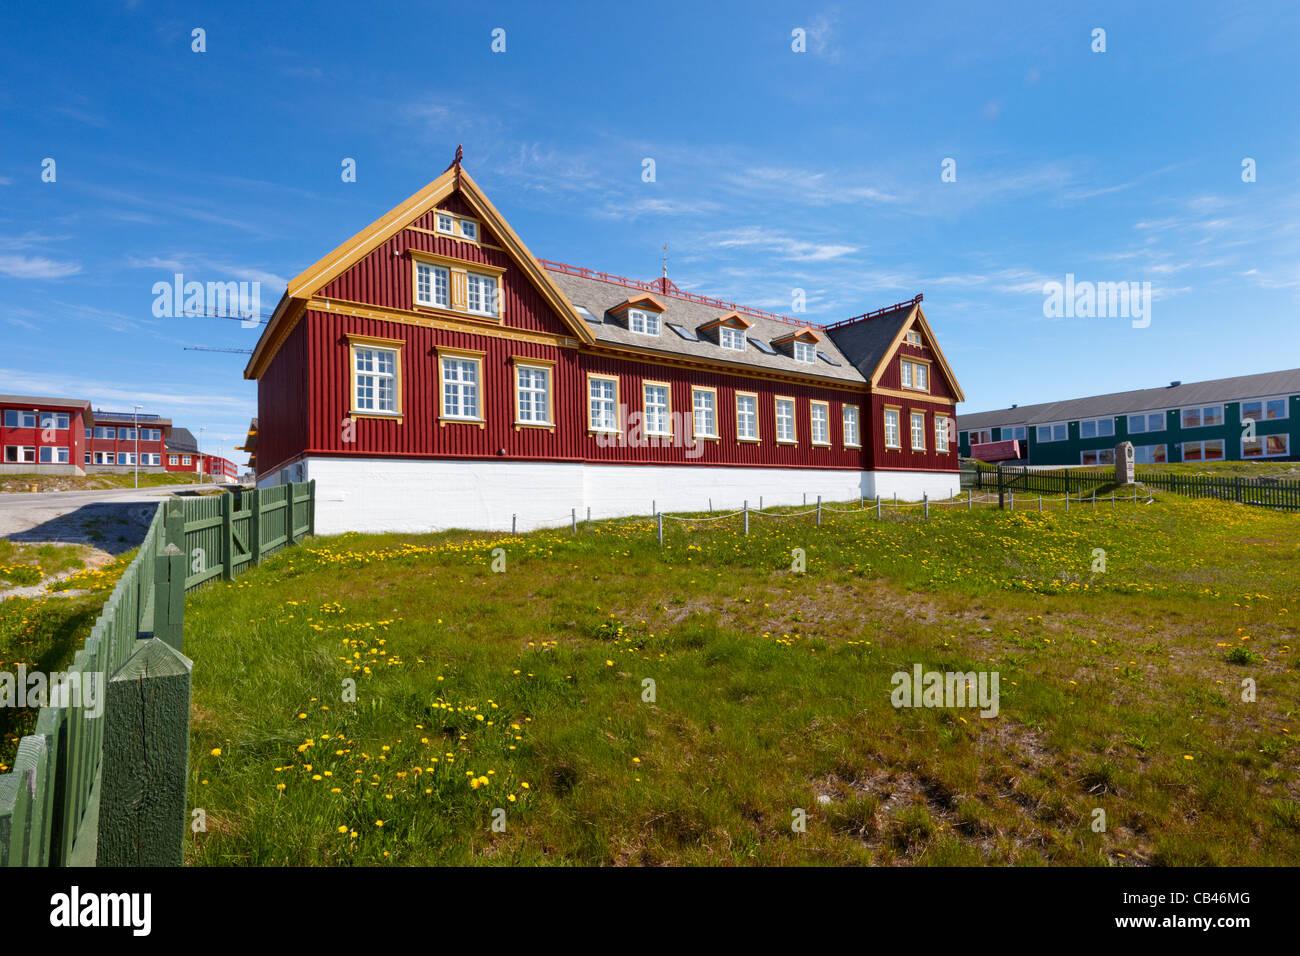 Ilinniarfissuaq Teachers Training College von Grönland, Nuuk Stockbild